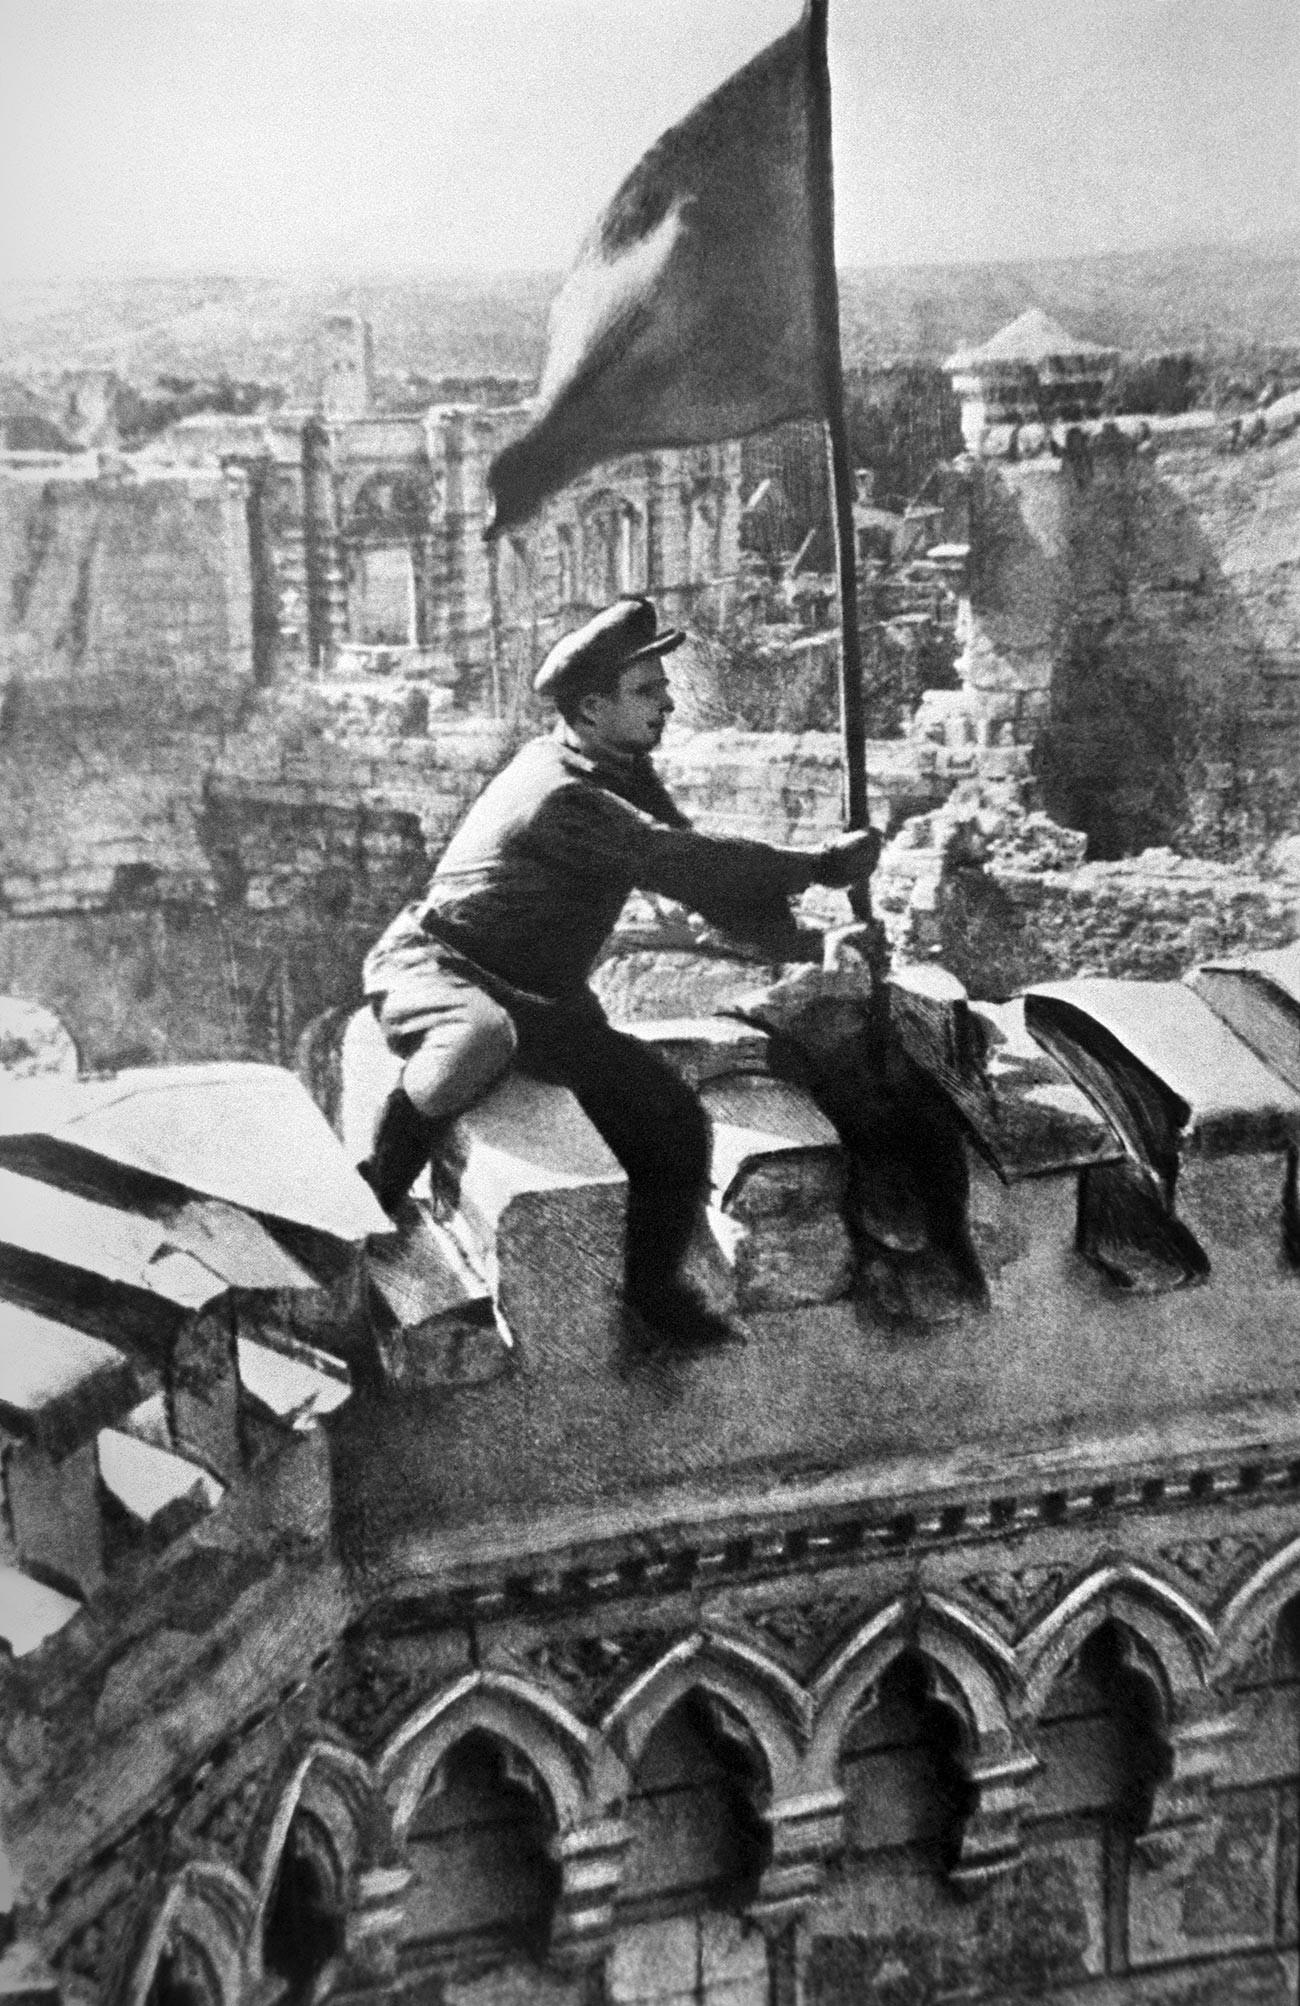 Tentara Merah mengangkat Bendera Kemenangan atas Kekaisaran Chisinau yang dibebaskan, 1944.